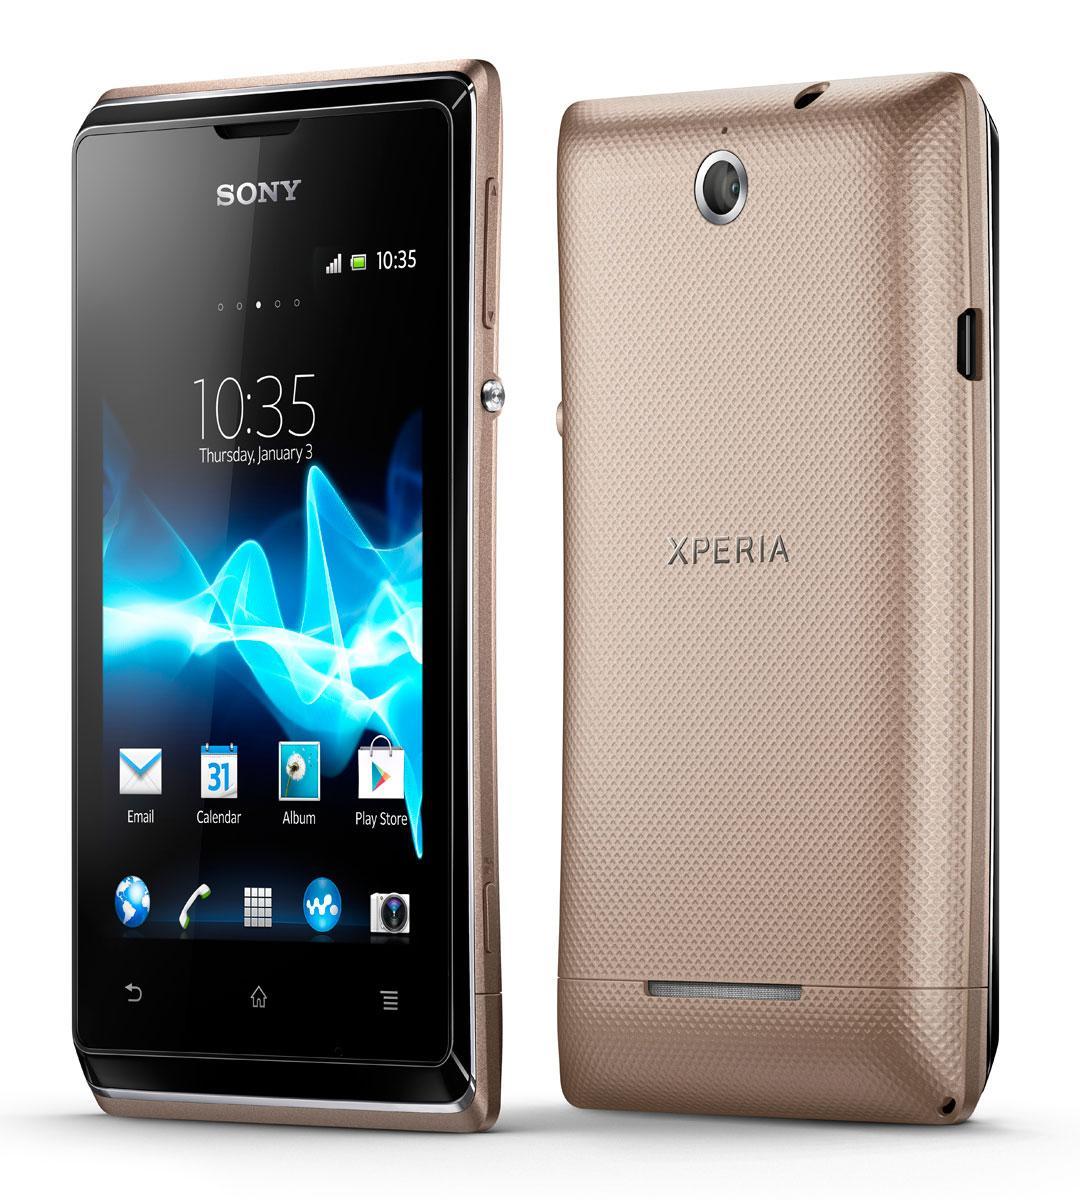 Sony Xperia E vista frontal y trasera